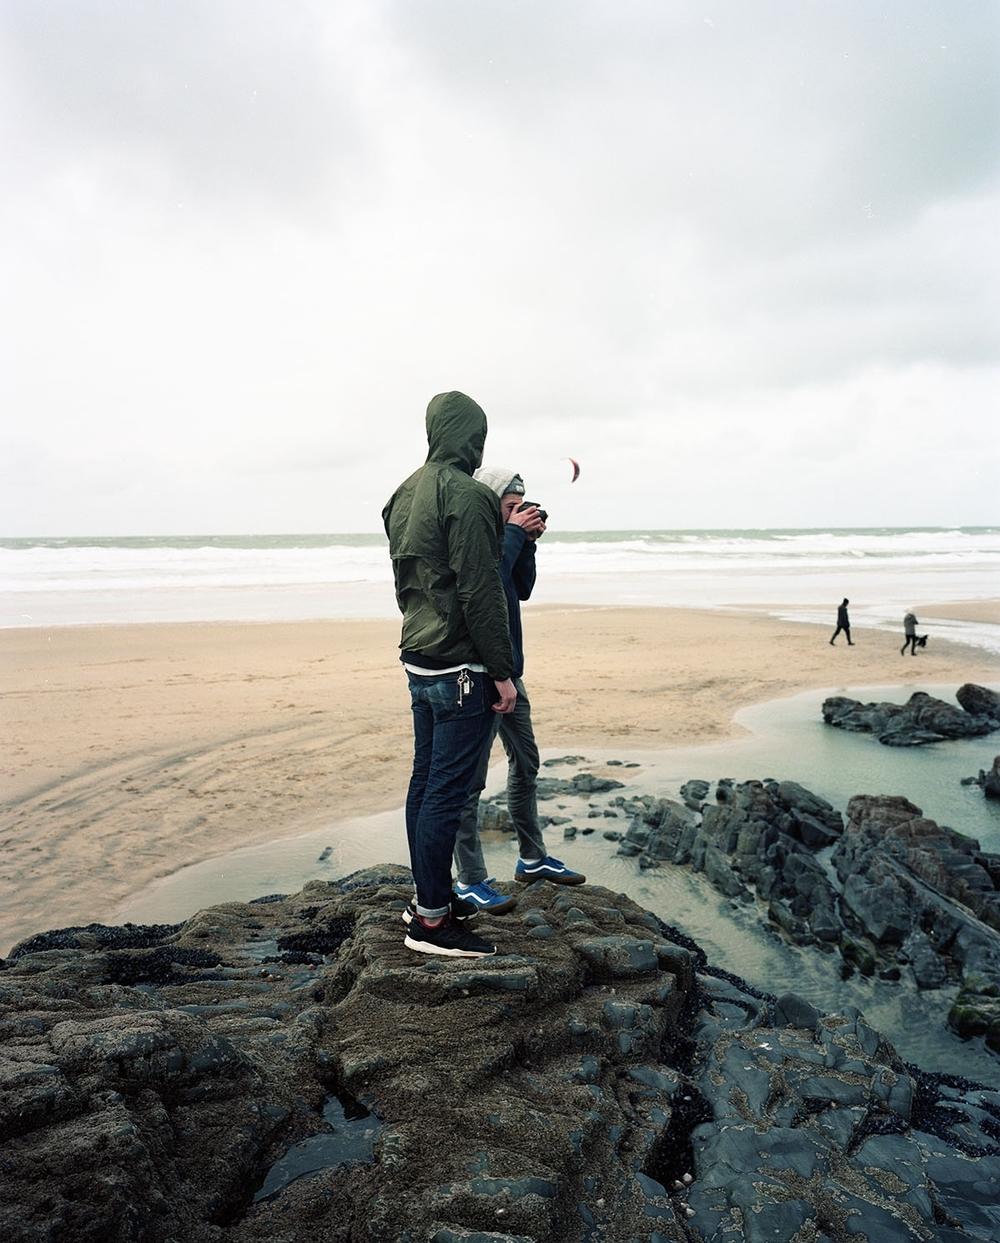 Beach 5 | Gwithian | Kyle Grainger